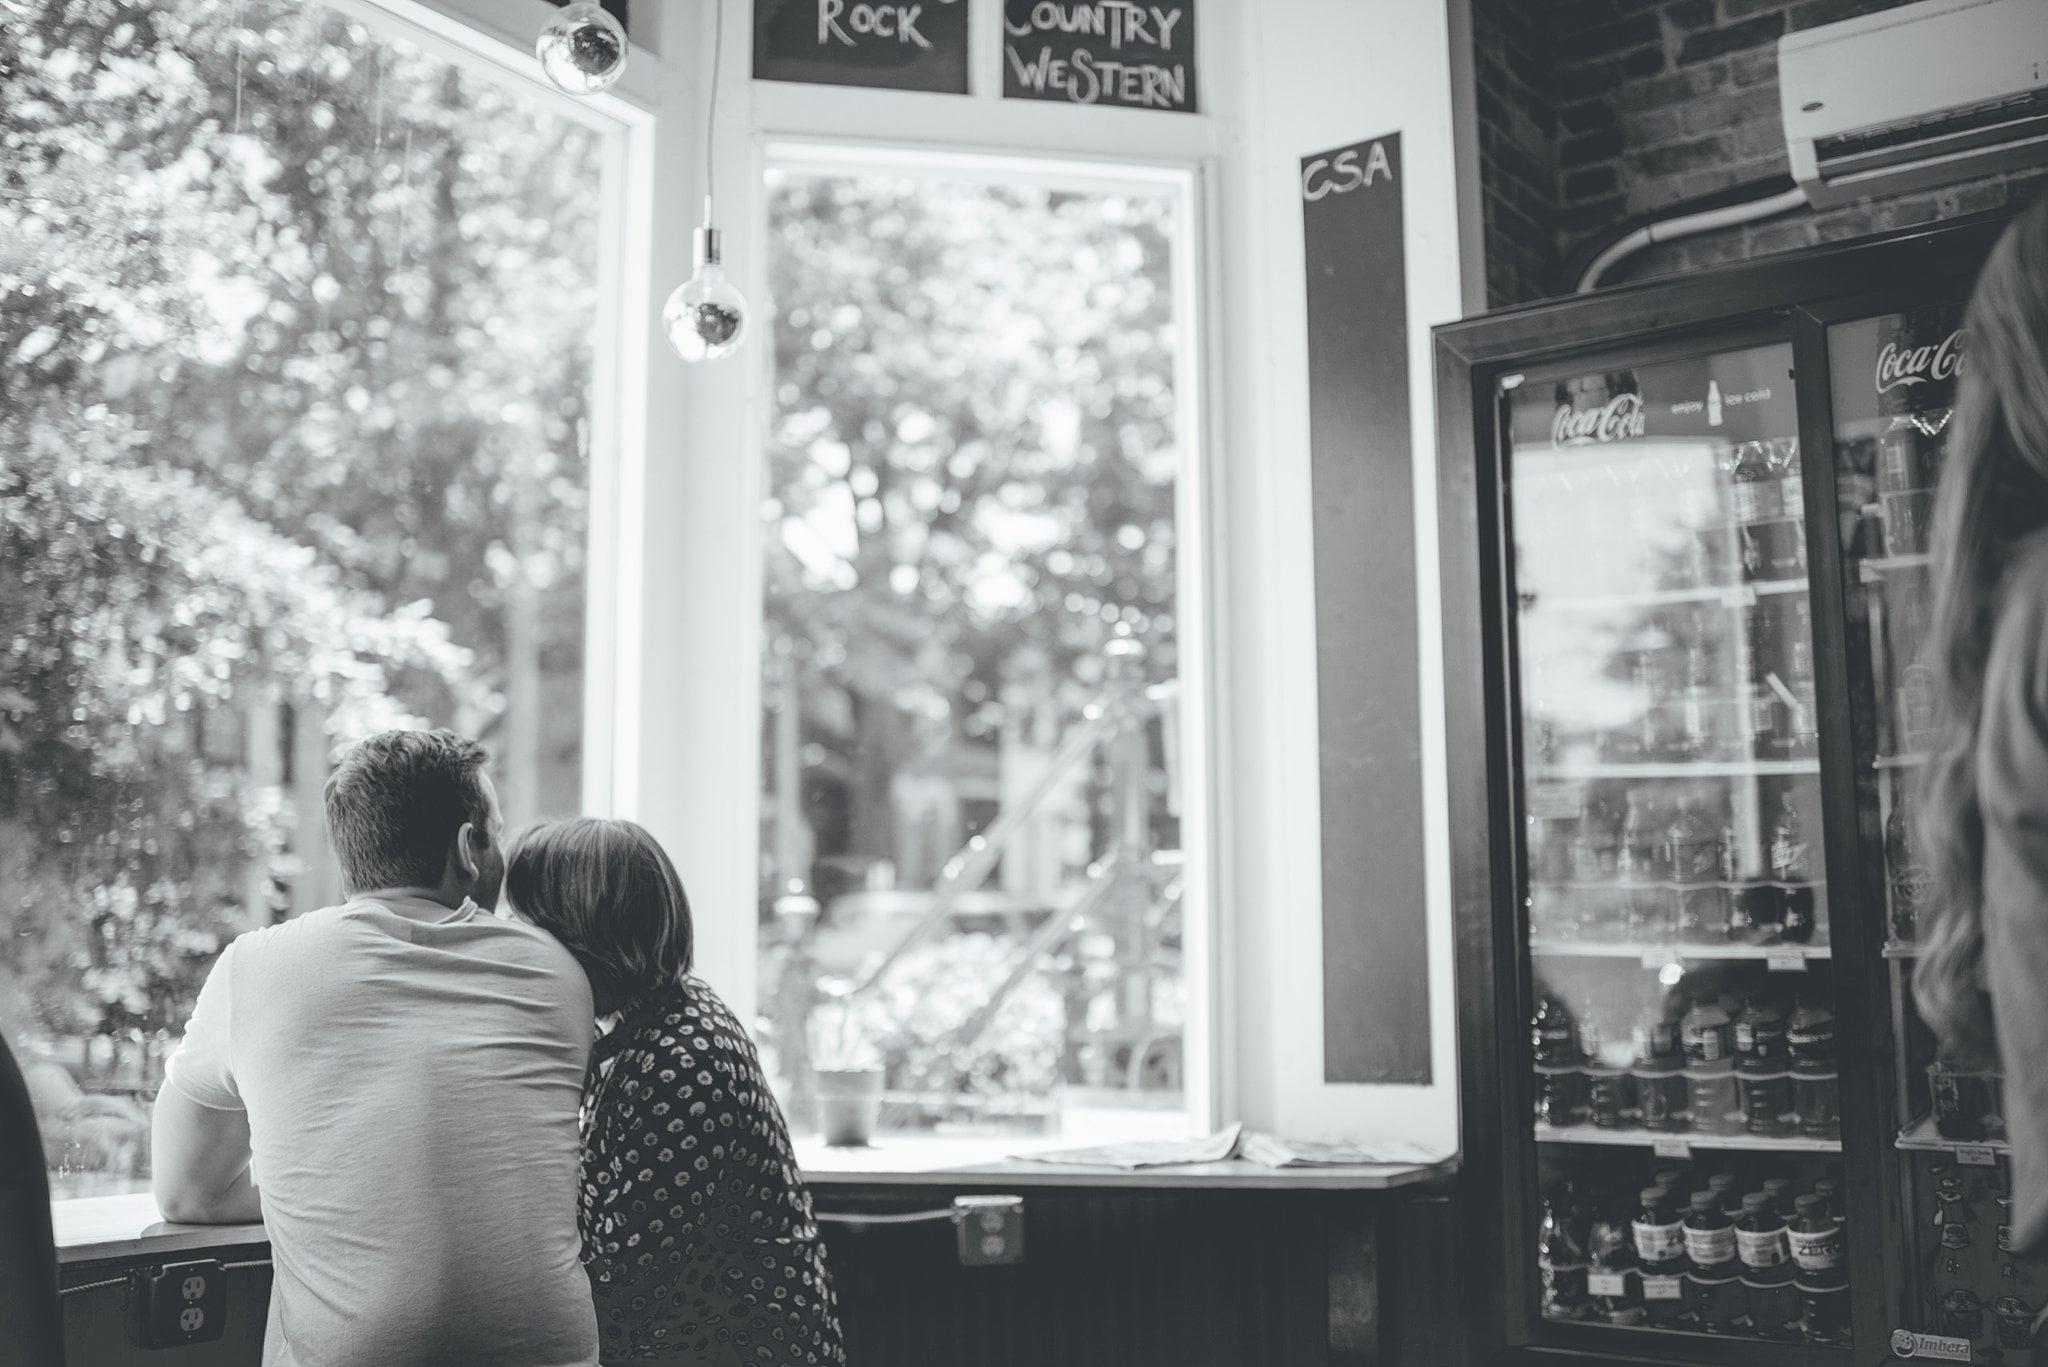 Perpanjangan paspor anak online dating